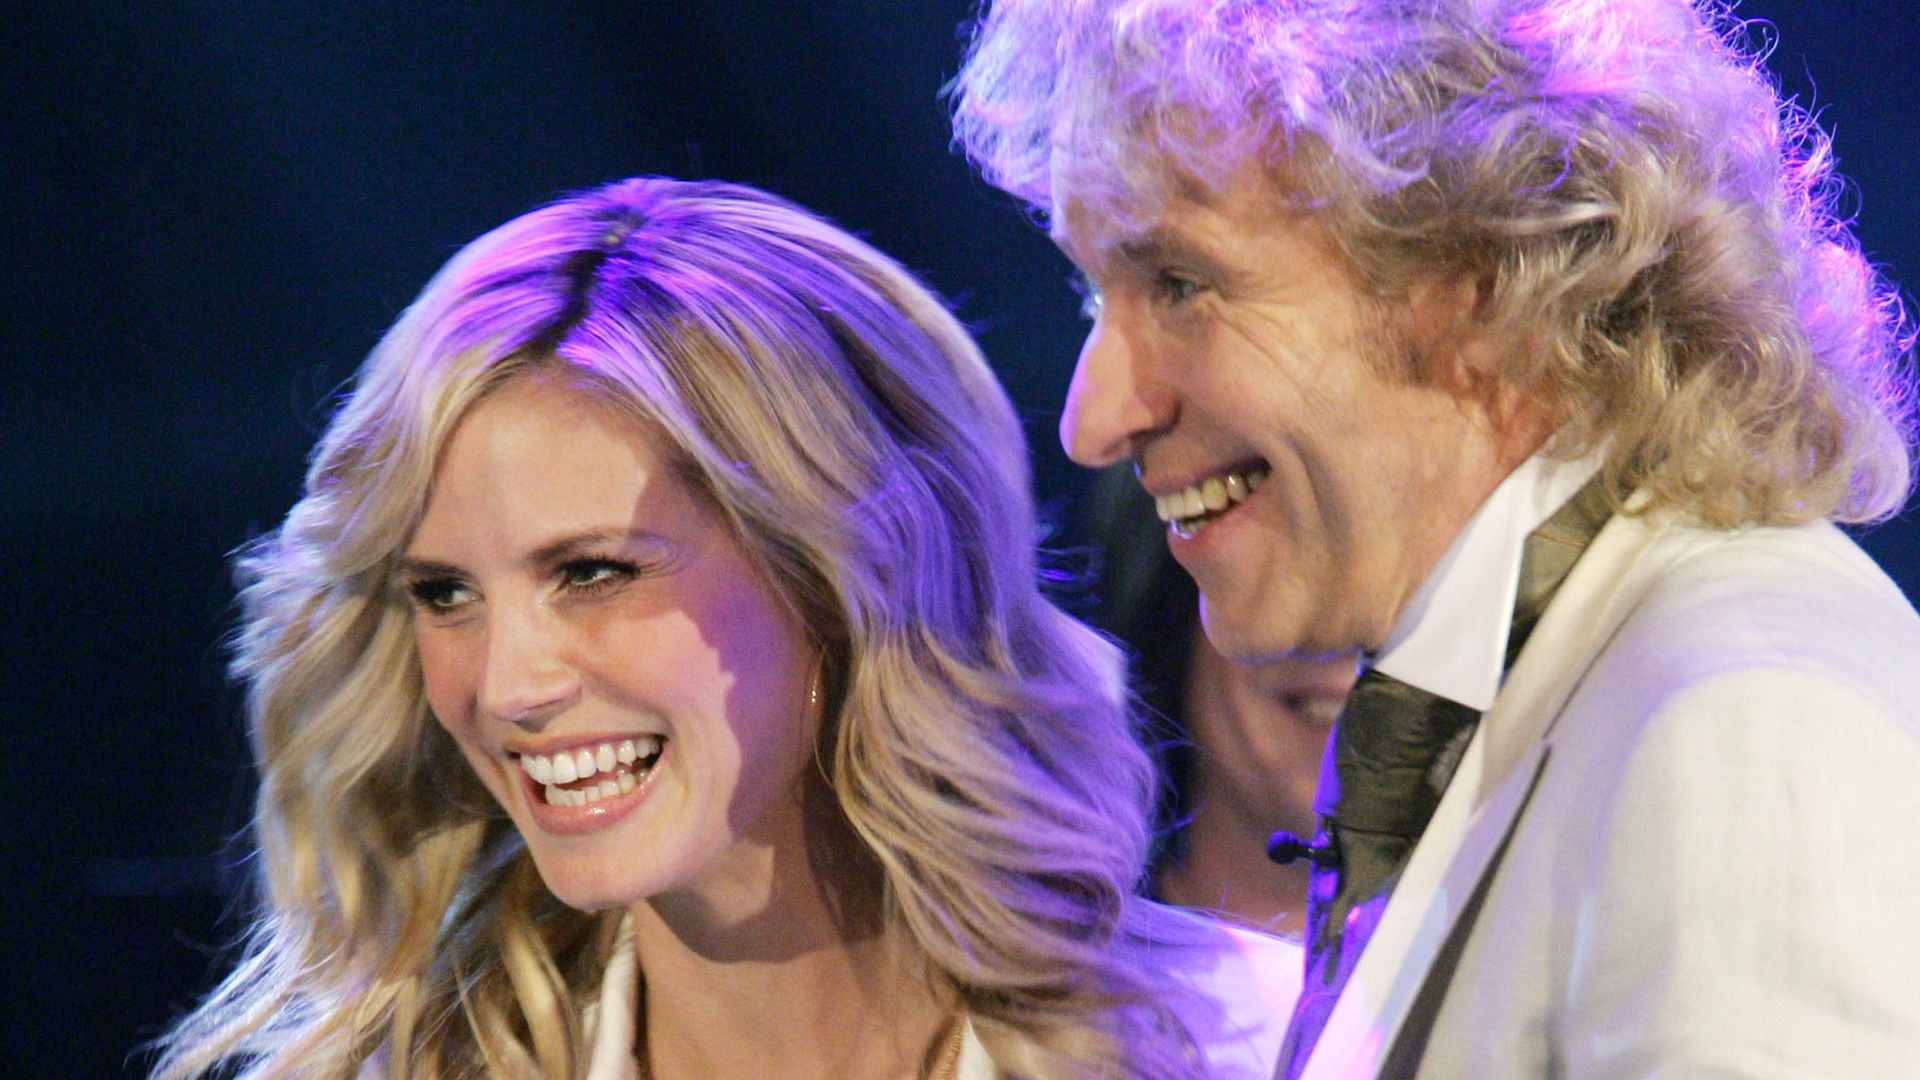 Heidi Klum Freut Sich, Dich Zu Sehen